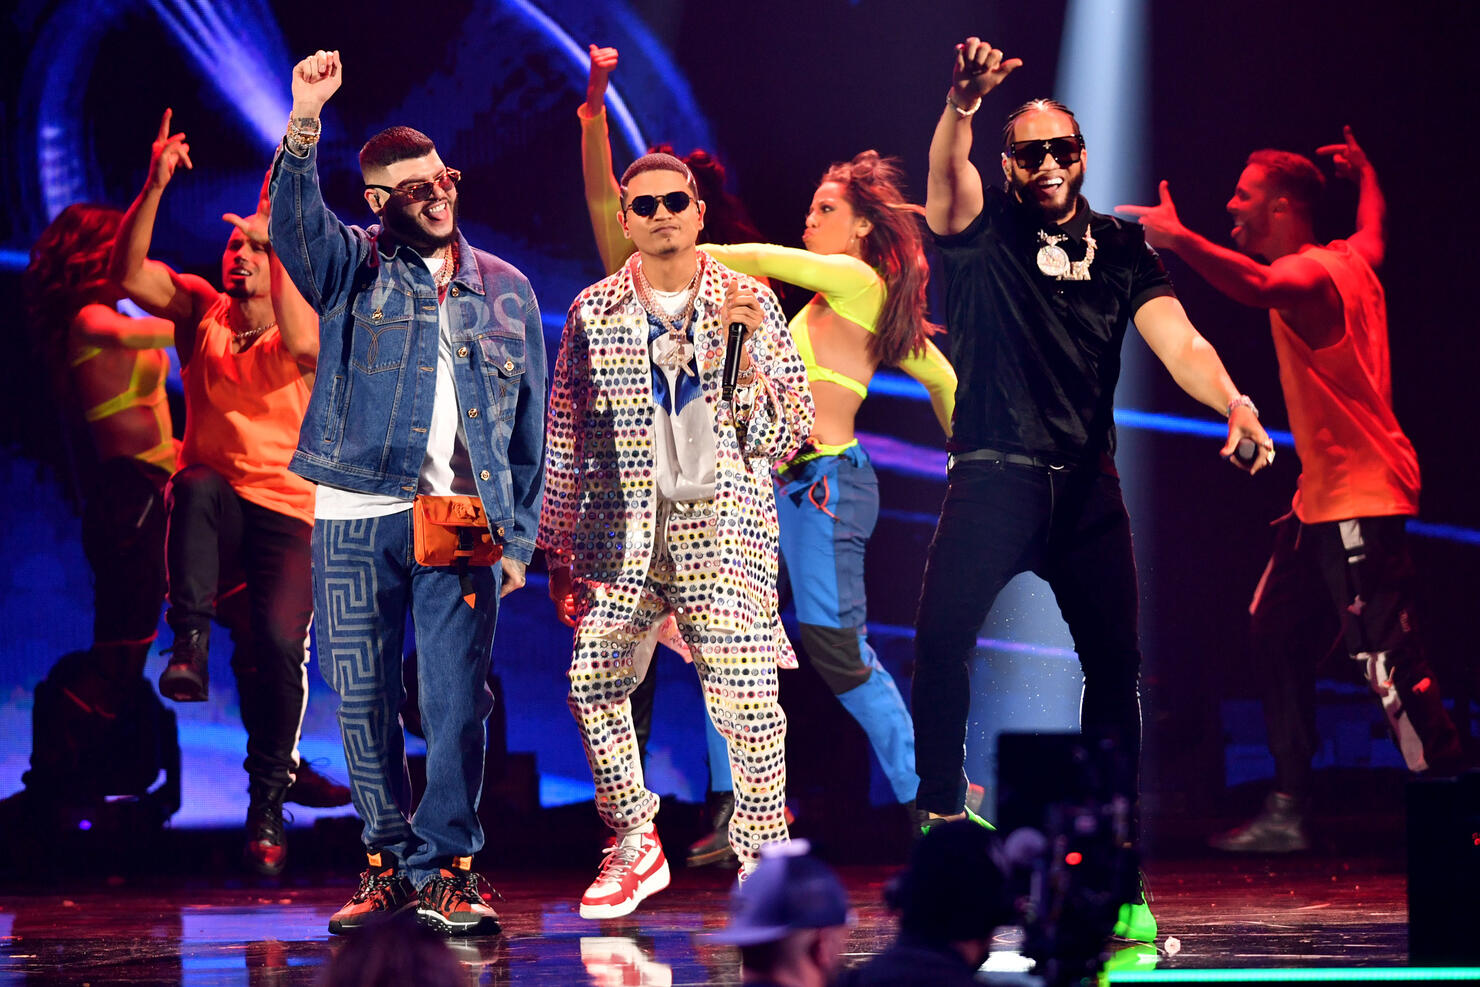 Premios Juventud 2021 - Show